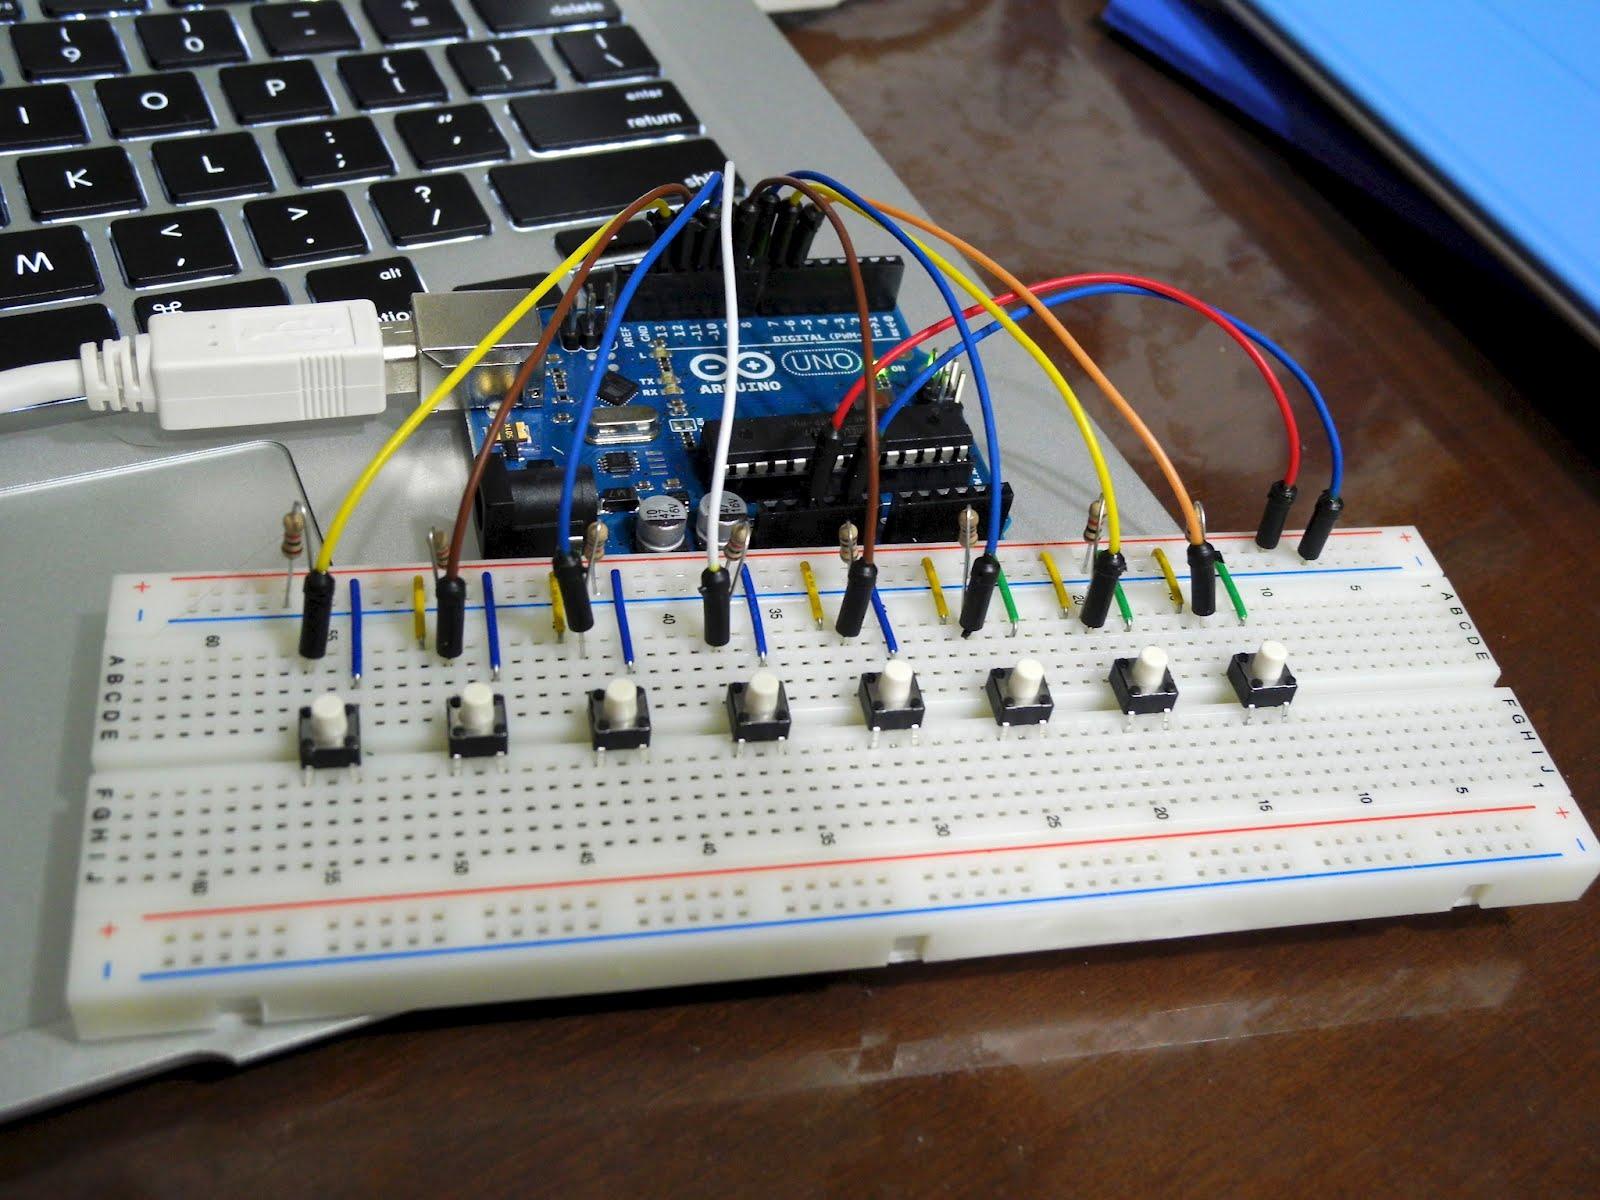 Arduino garageband midiキーボードもどき eleclog